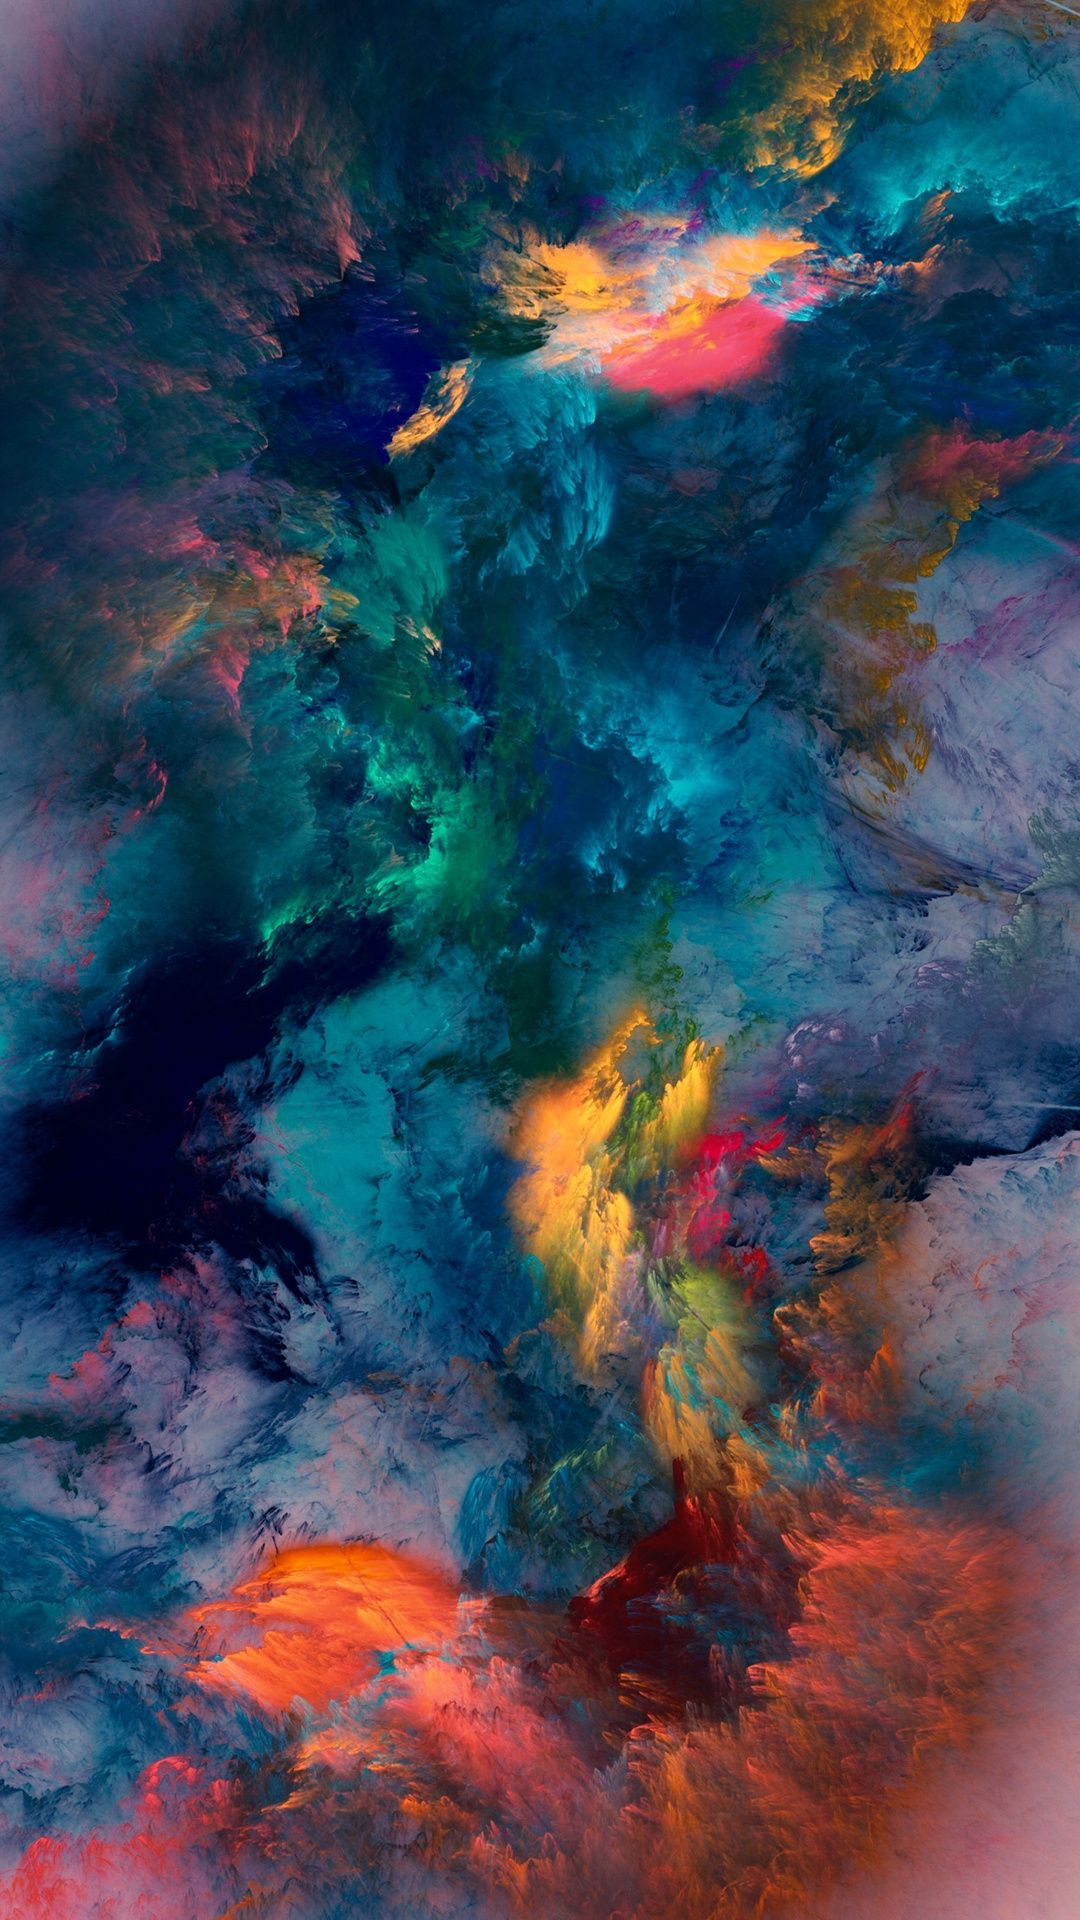 Colour Storm Wallpaper - Iphone 7 Plus Duvar Kağıdı , HD Wallpaper & Backgrounds